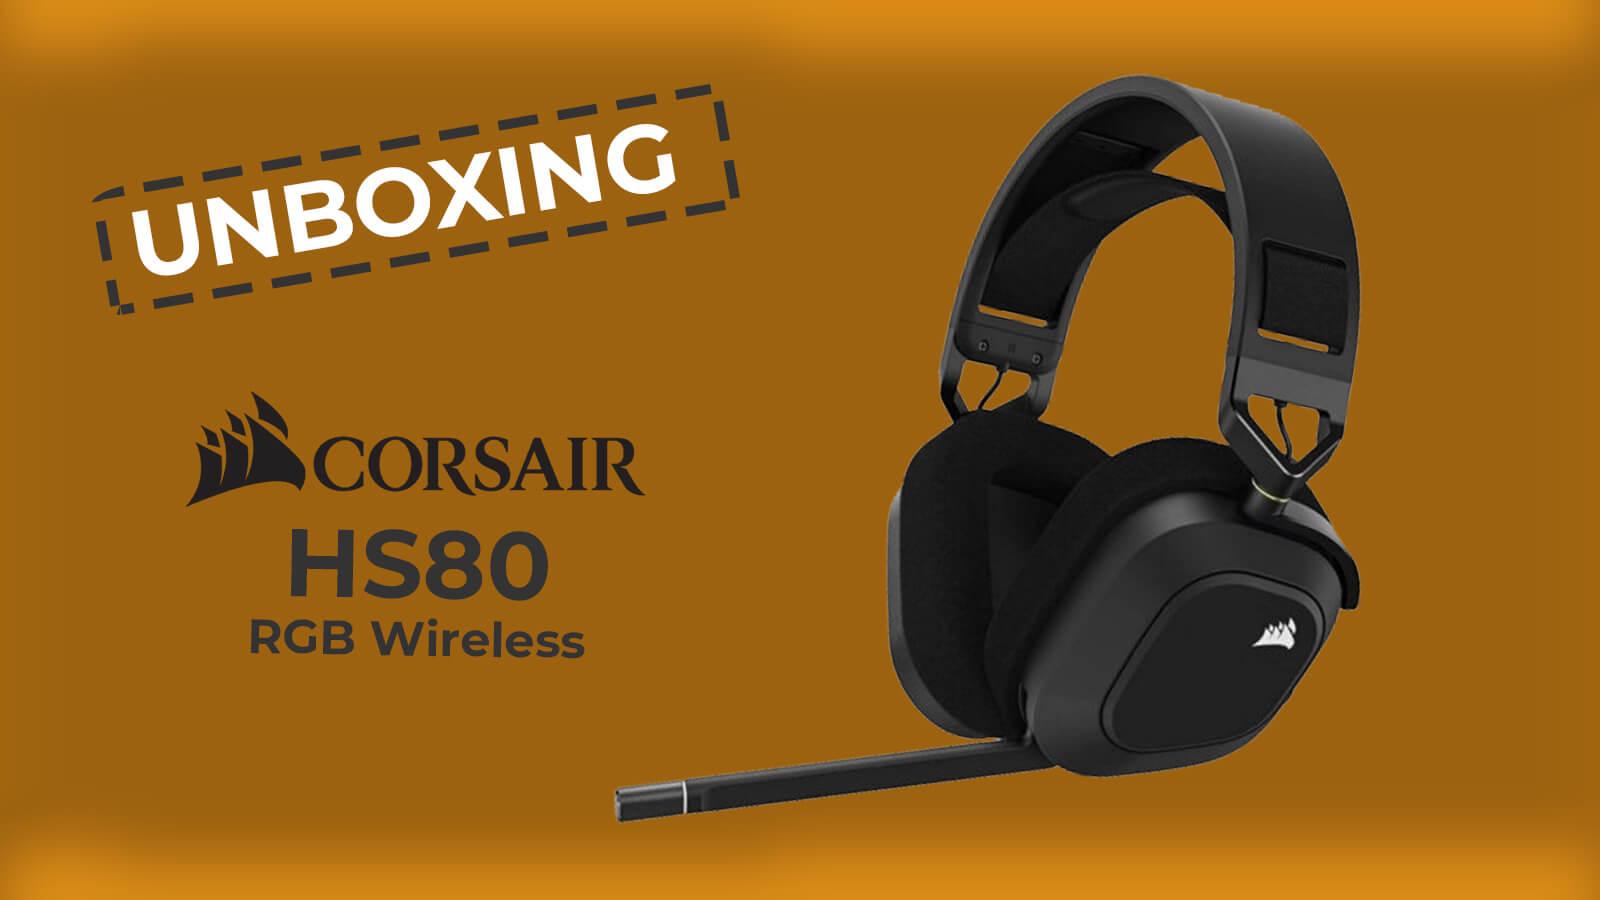 Unboxing Corsair HS80 RGB Wireless